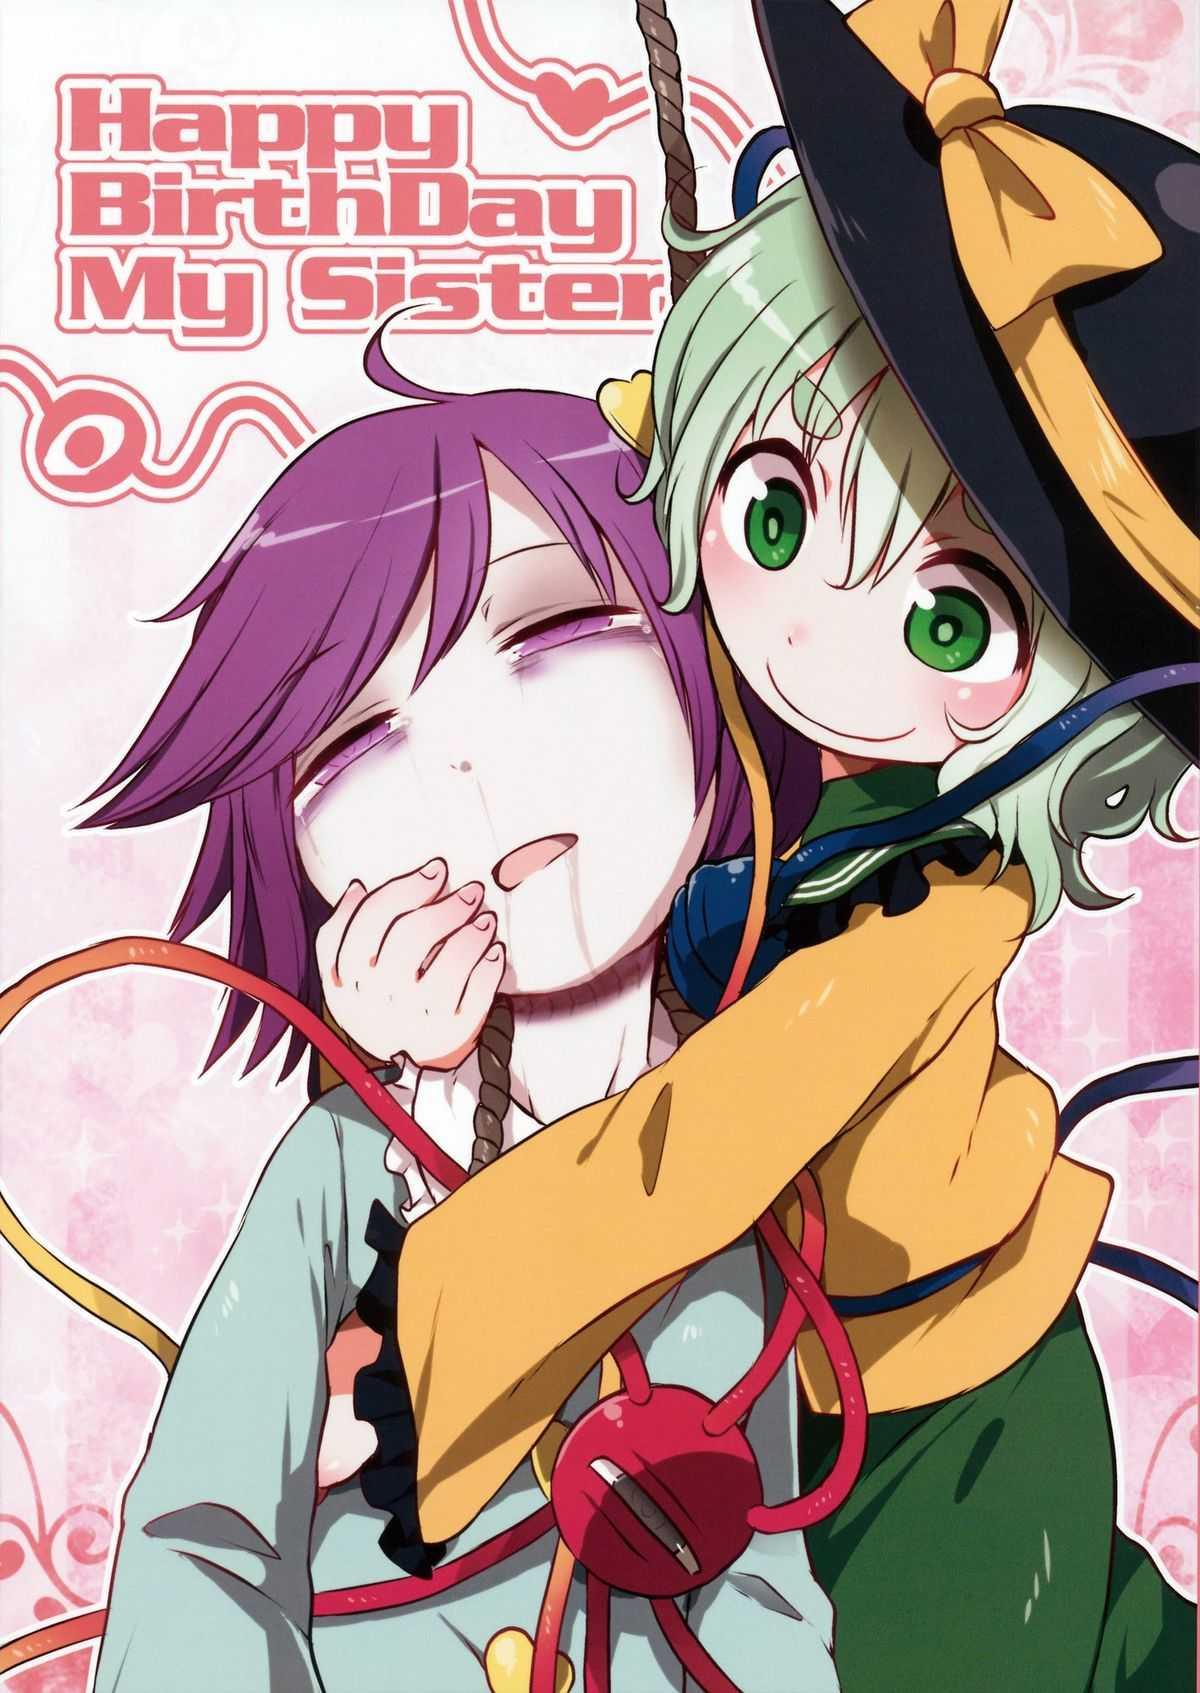 shuuki-reitaisai-2-02-harasaki-happy-birthday-my-sister-touhou-project